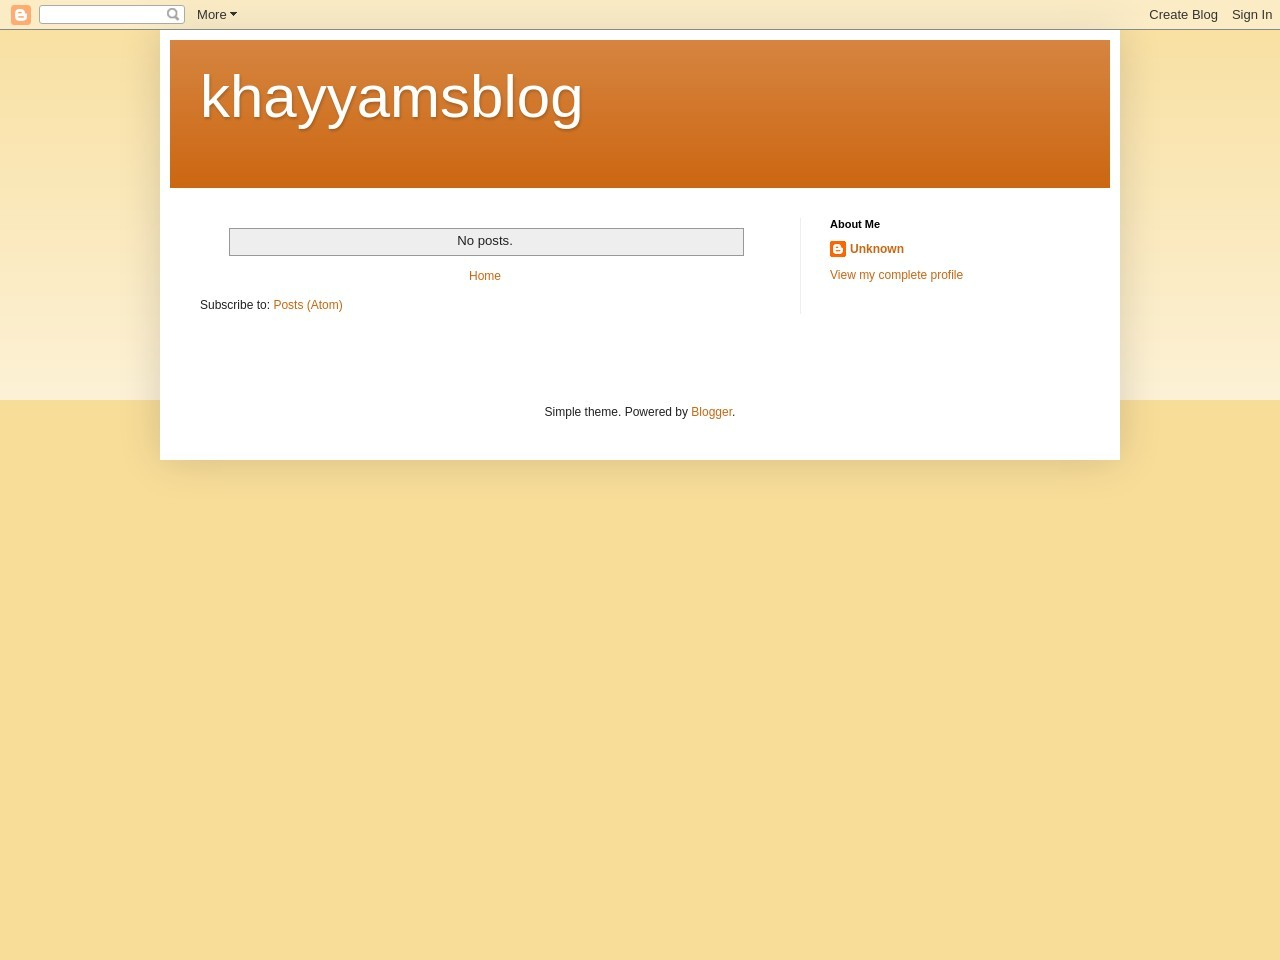 khayyamsblog